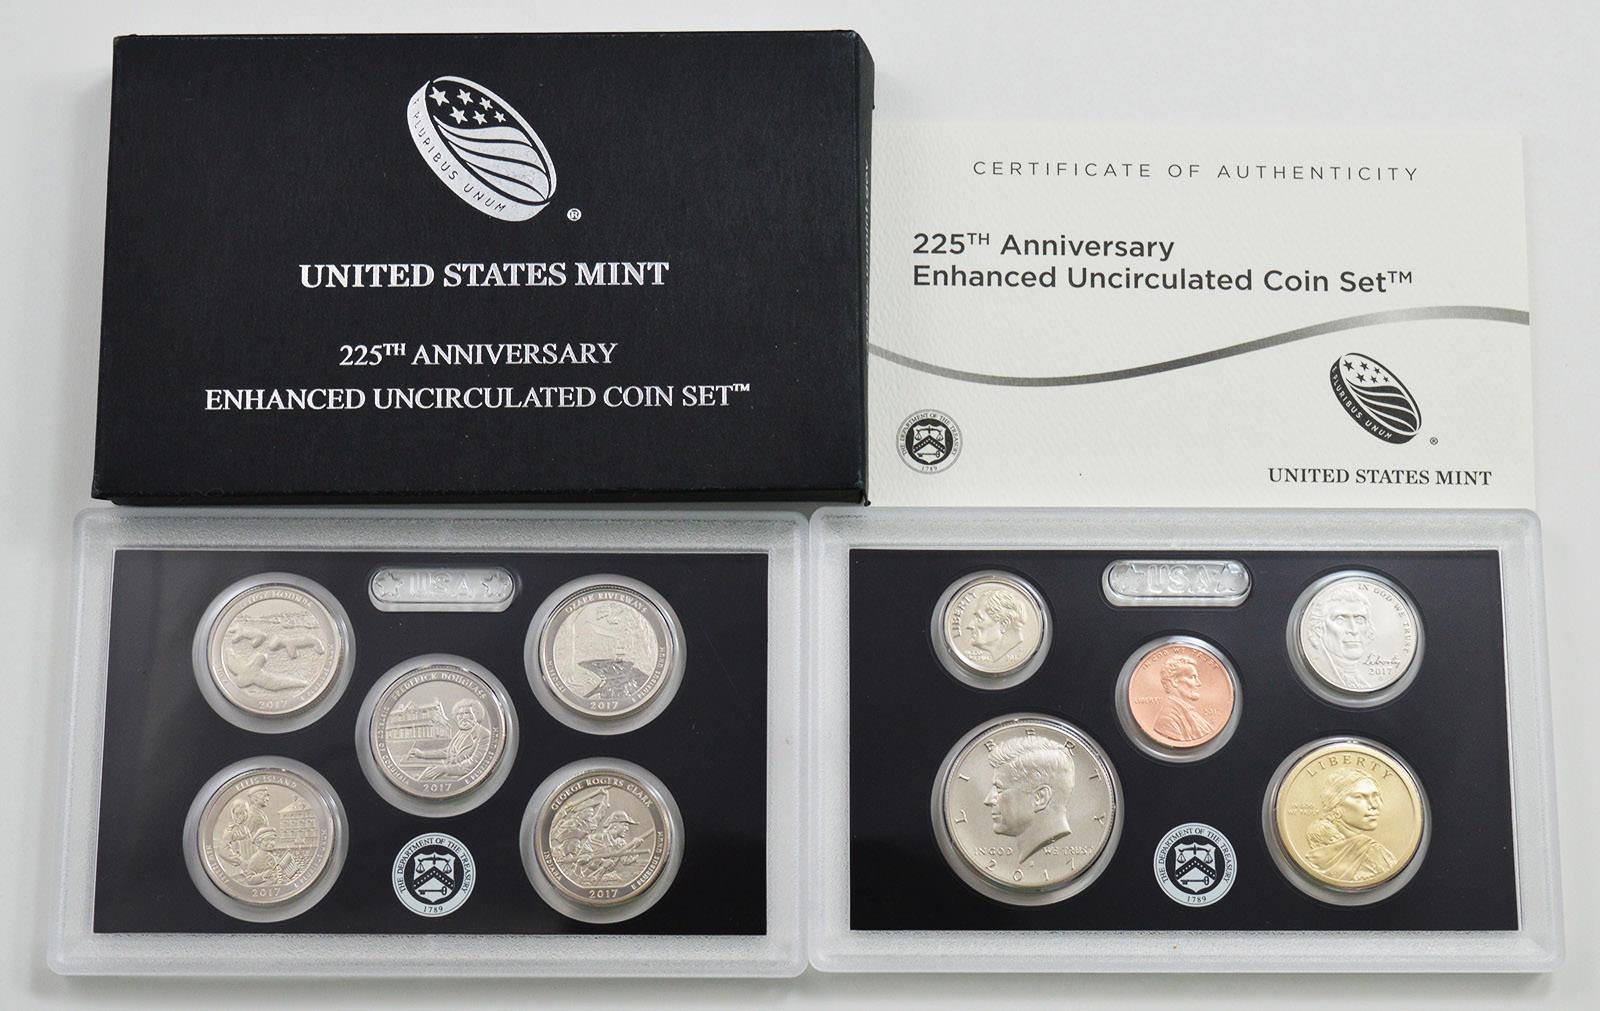 MINT 225TH ANNIVERSARY ENHANCED UNCIRCULATED COIN SET 2017  U.S